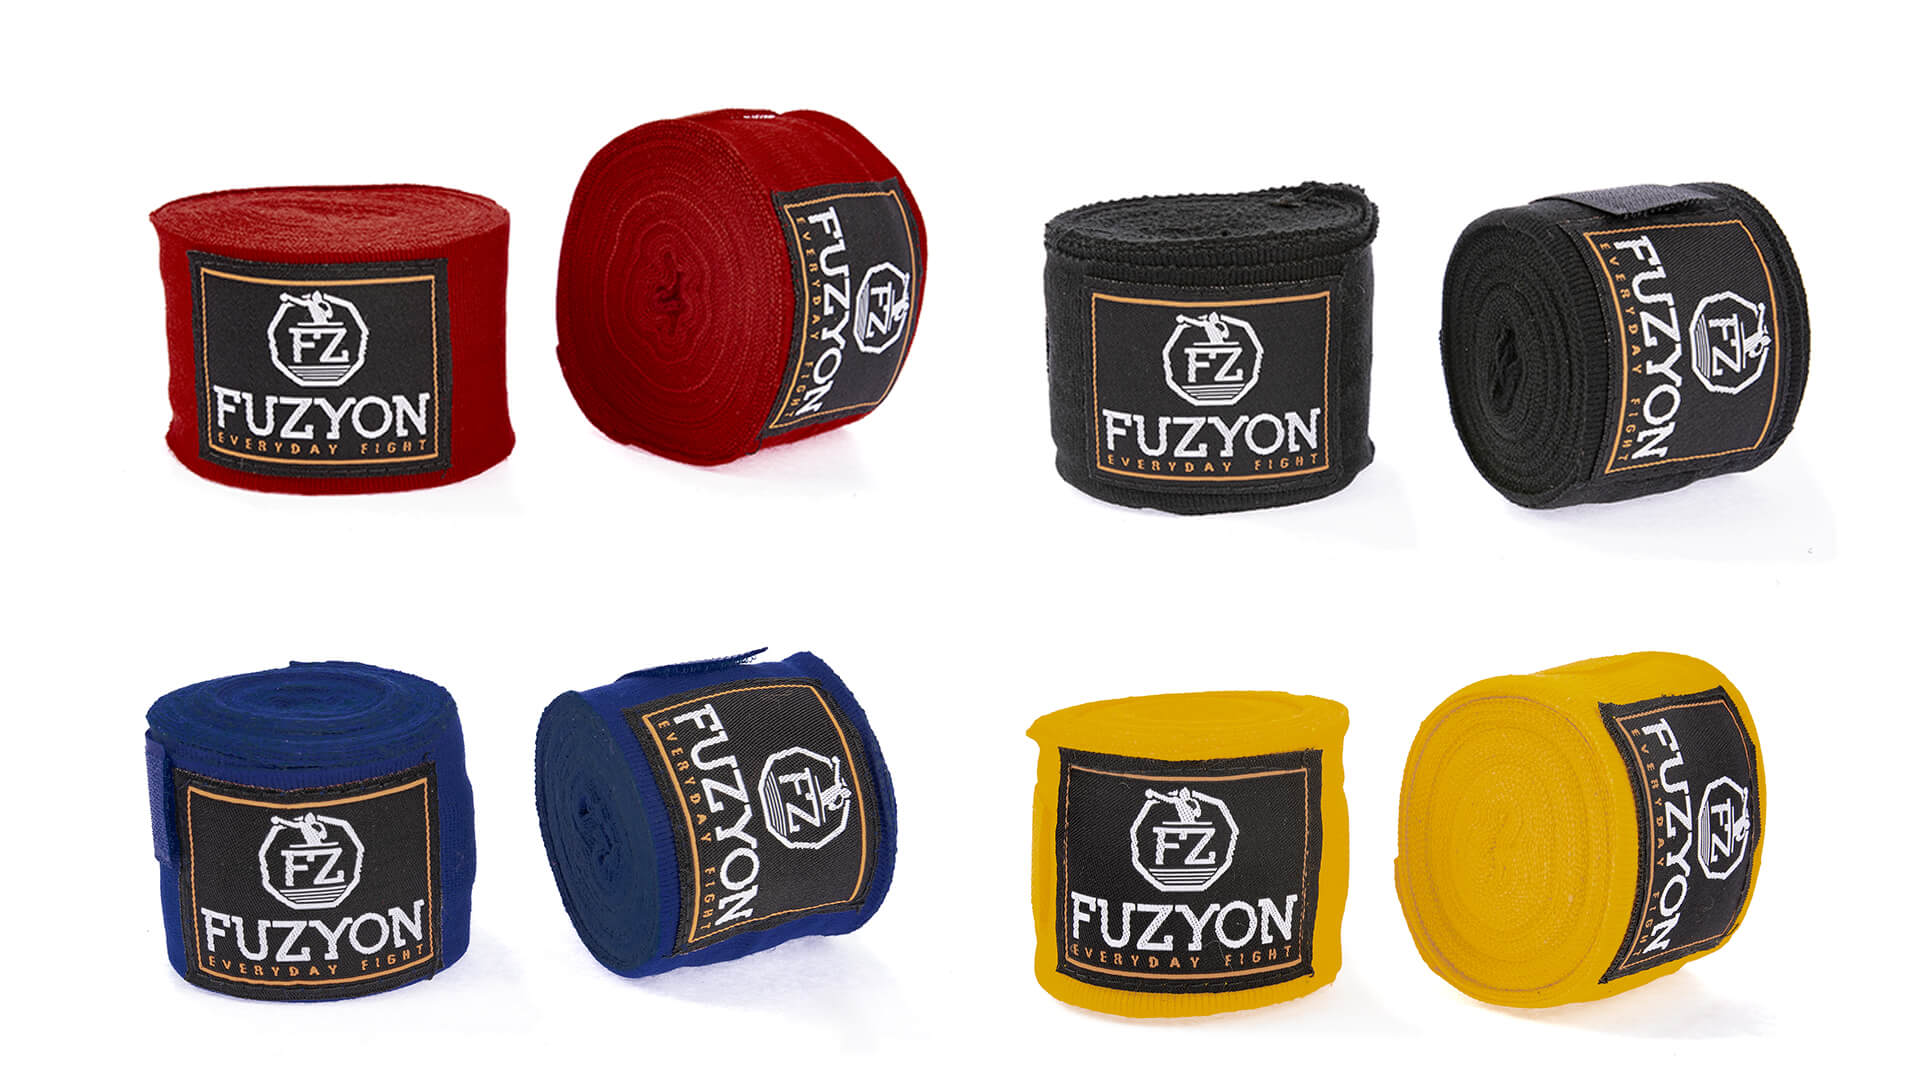 Kit 4 Bandagens Muay Thai Fuzyon